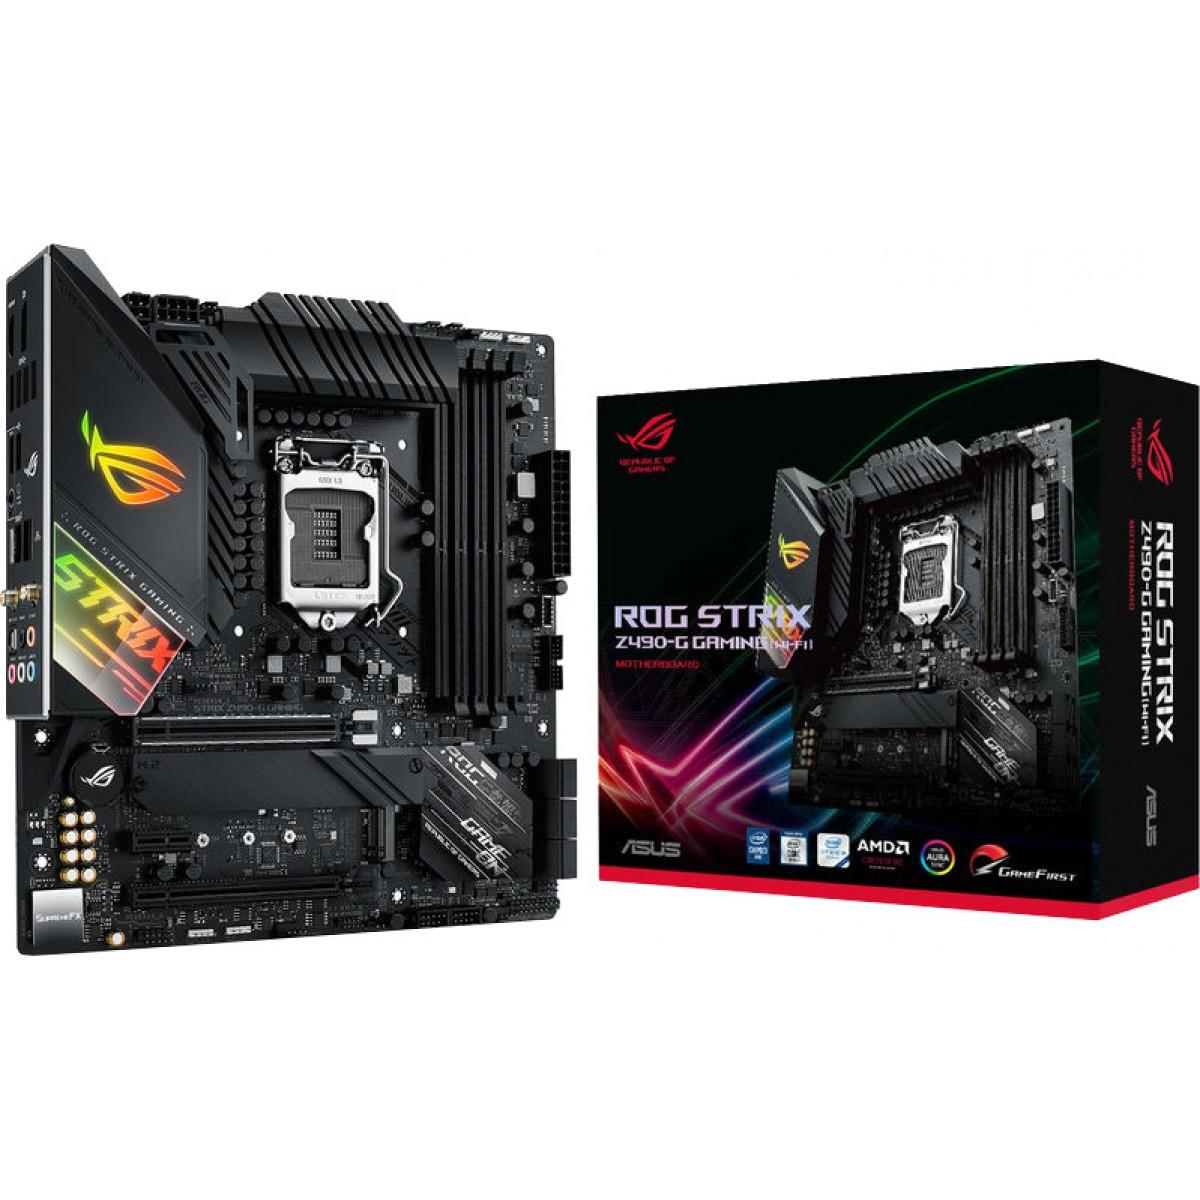 Placa Mãe Asus Rog Strix Z490-G Gaming Wi-Fi, Chipset Z490, Intel LGA 1200, mATX, DDR4